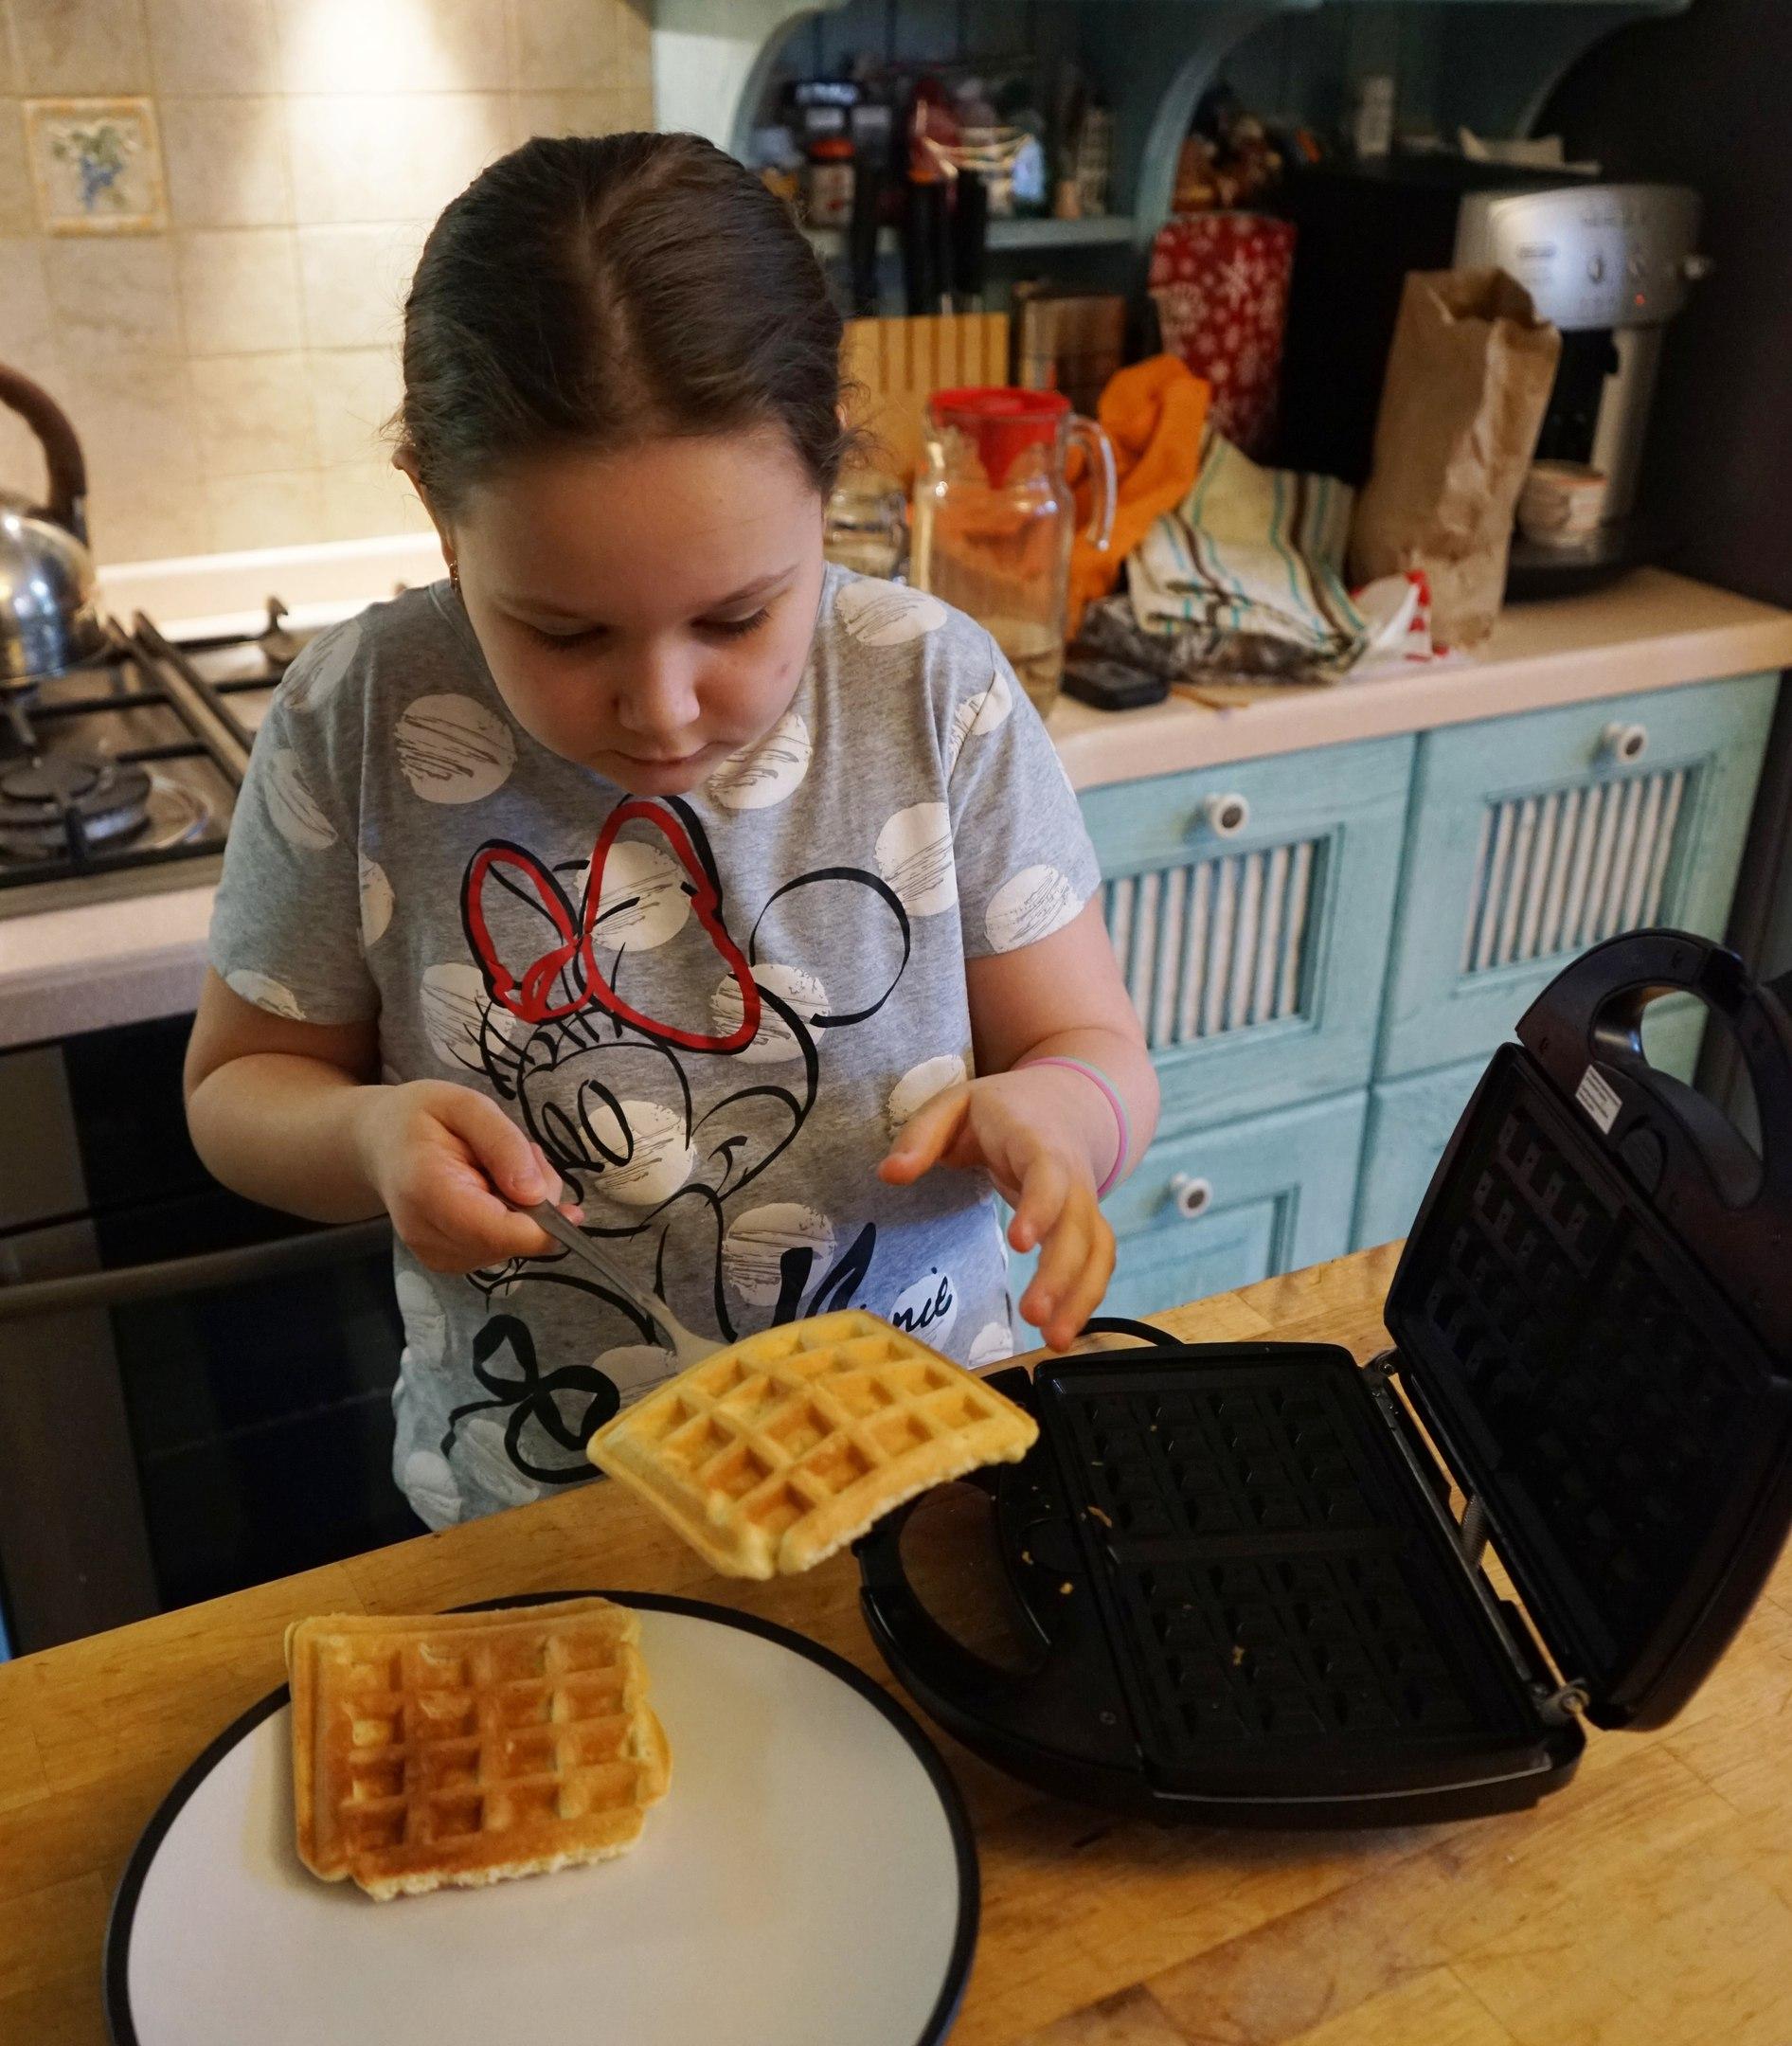 Жена утром готовила завтрак голая фото 46-830